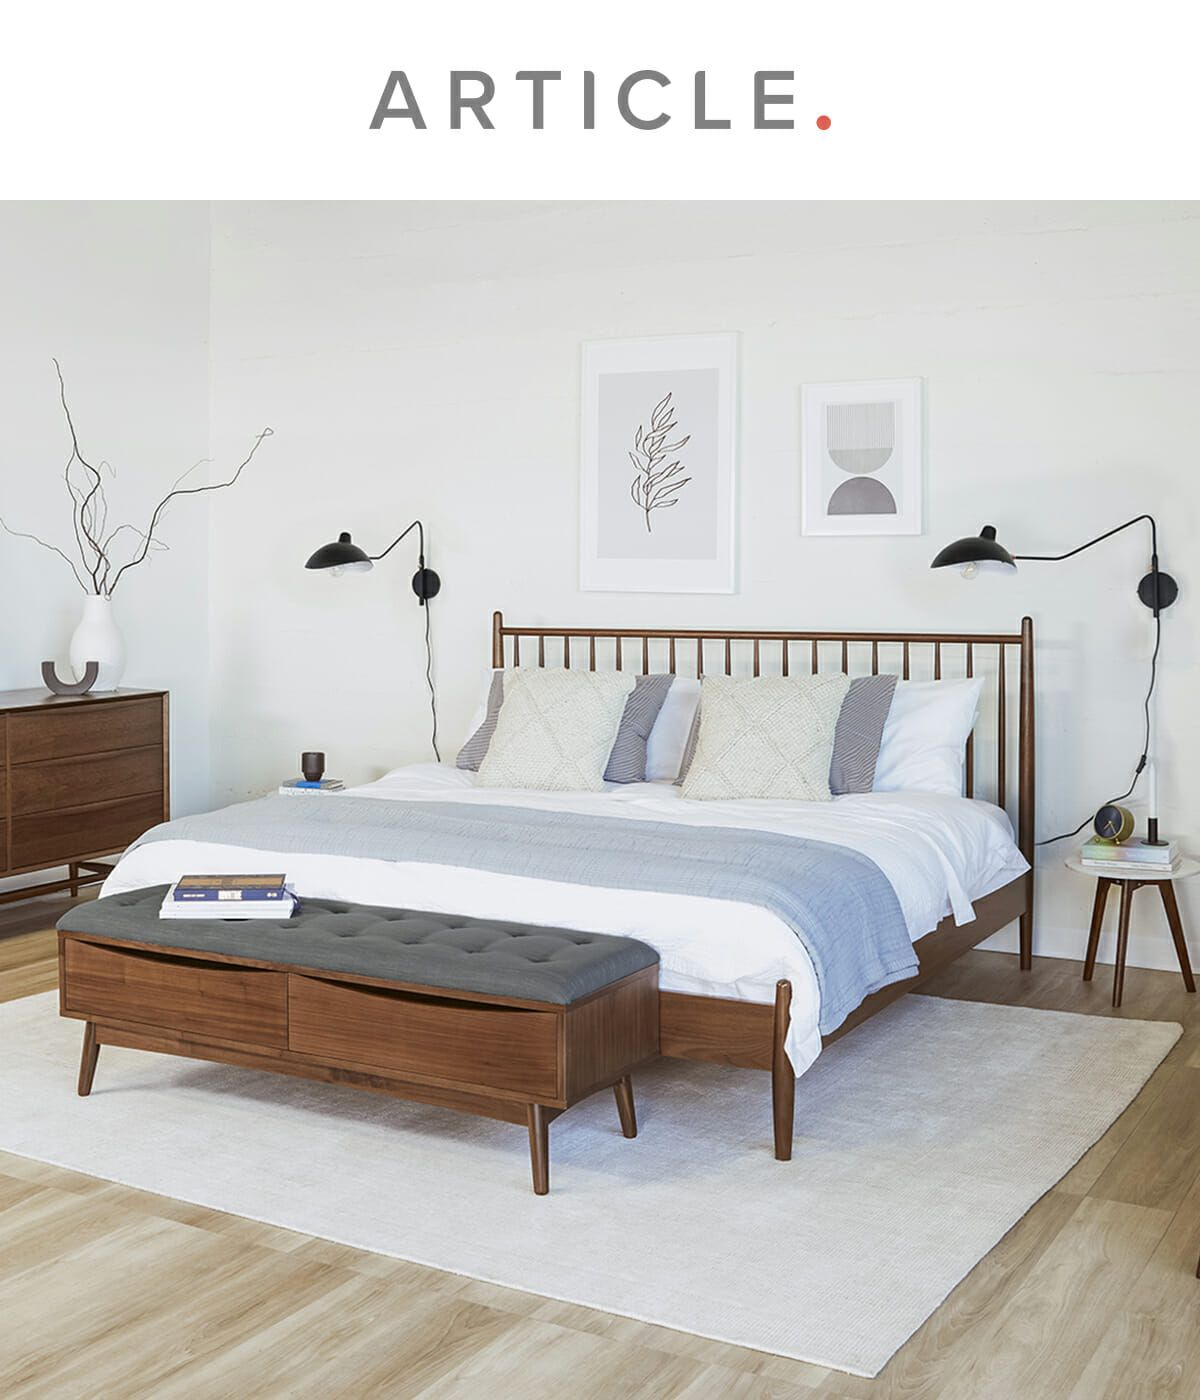 Lenia Walnut King Bed  Bedroom bed design, Home decor bedroom